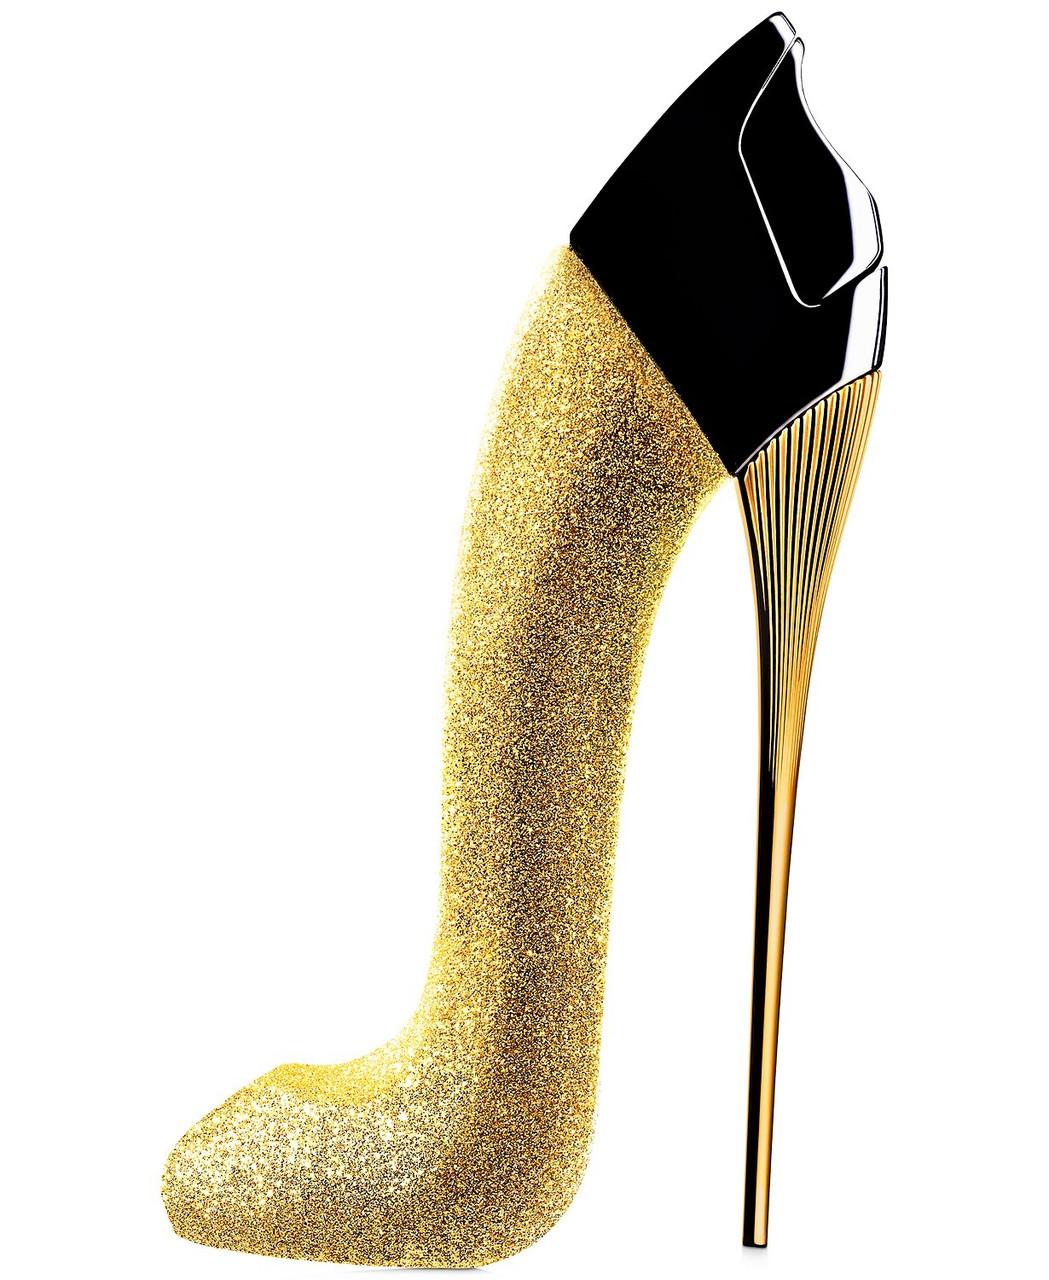 Carolina Herrera Good Girl Glorious Gold edp 80ml Tester, Spain